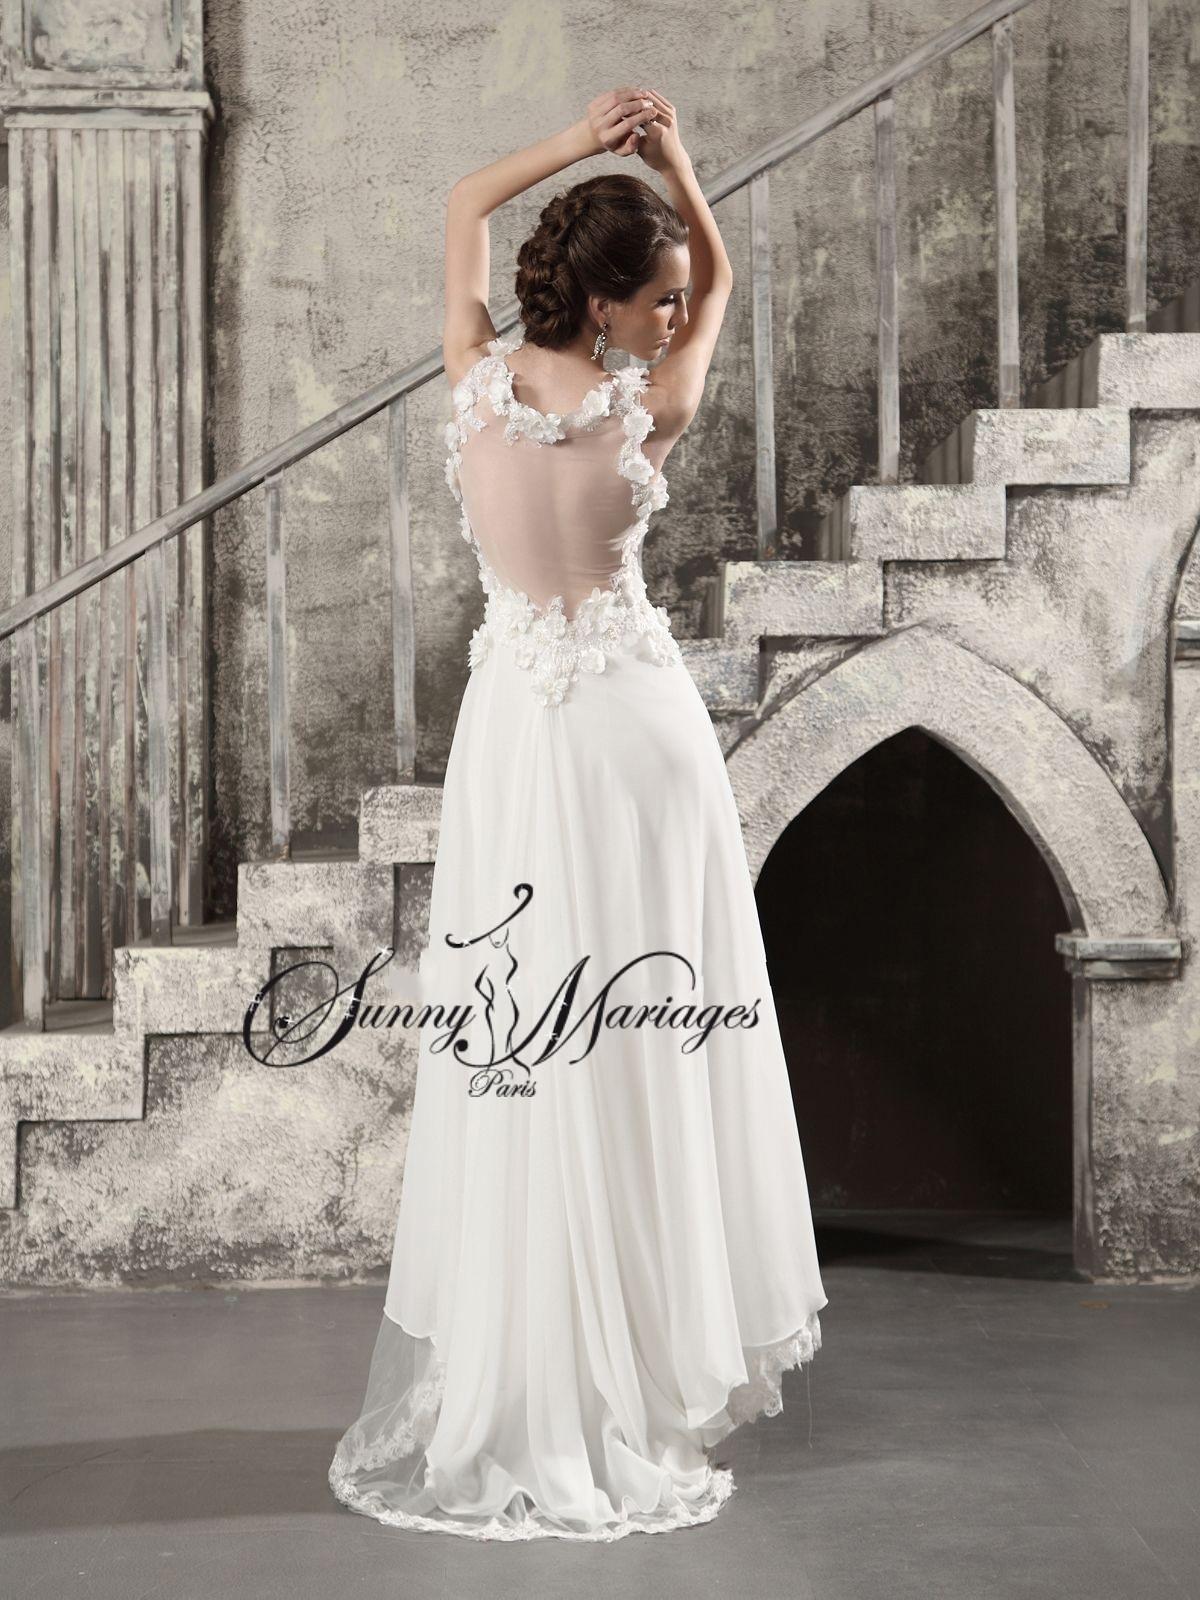 robe de mariee fluide empire Sunnymariages confection robe de mariage ...